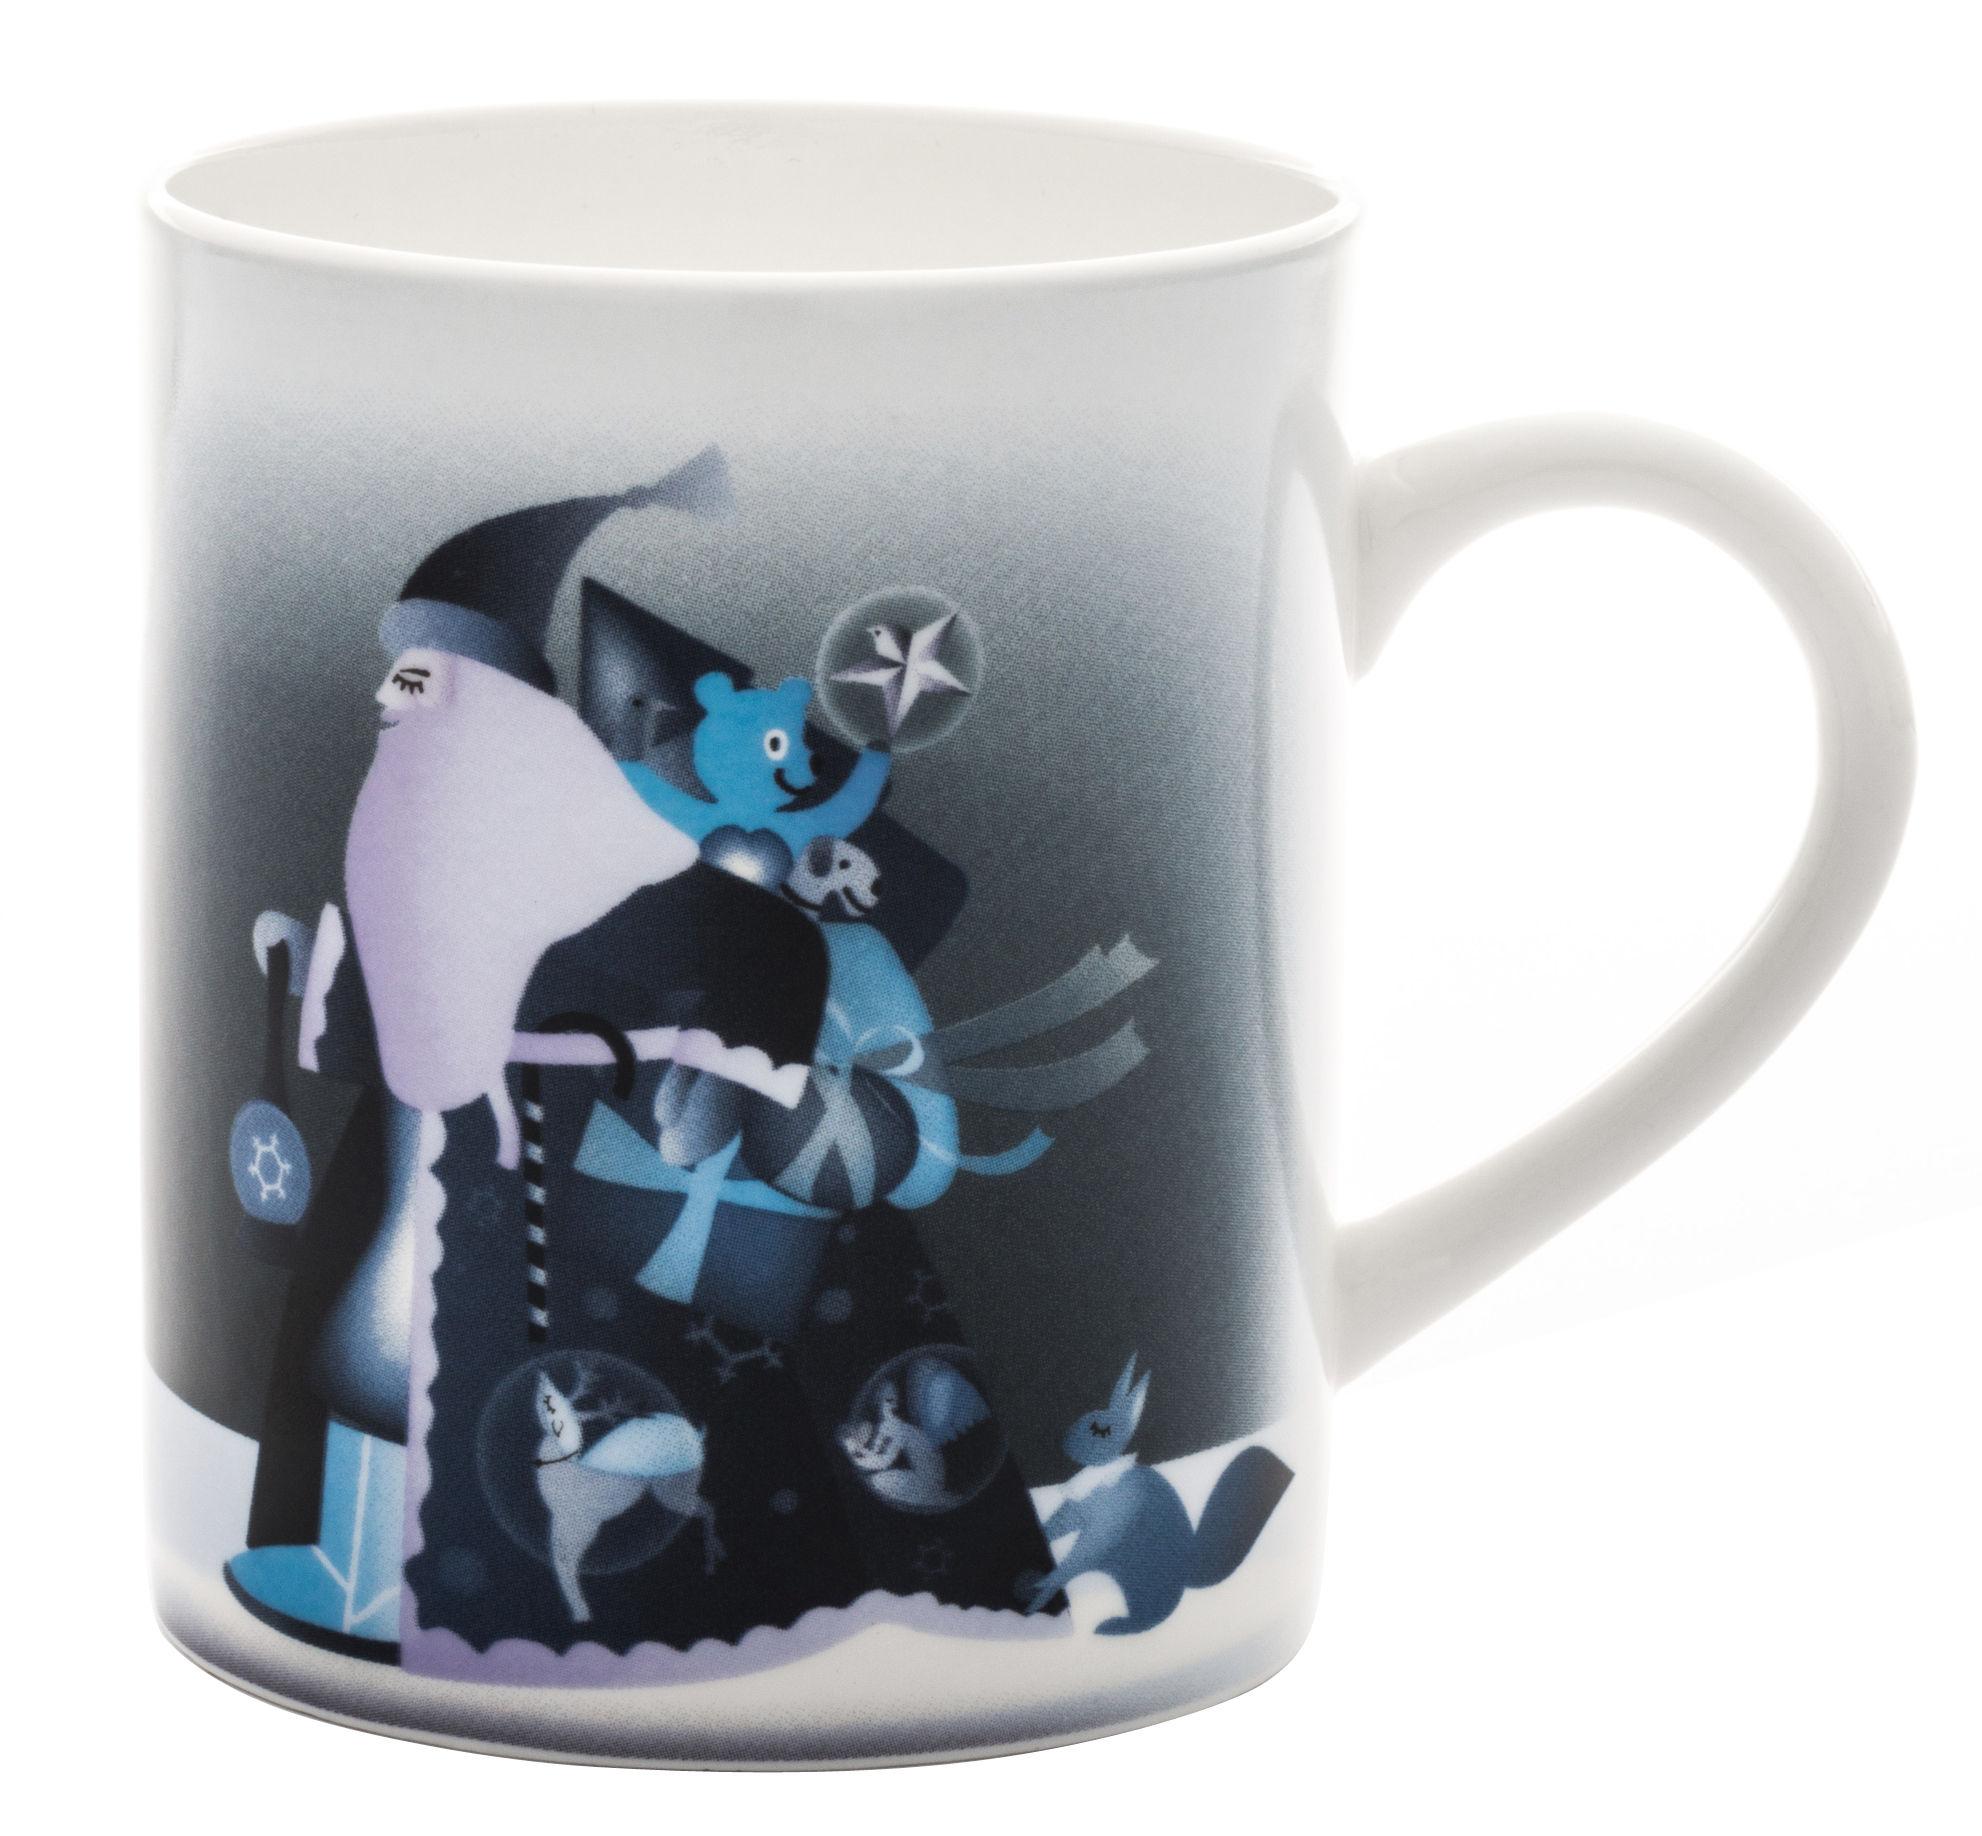 Tableware - Coffee Mugs & Tea Cups - Blue christmas Mug by A di Alessi - Father Christmas - China